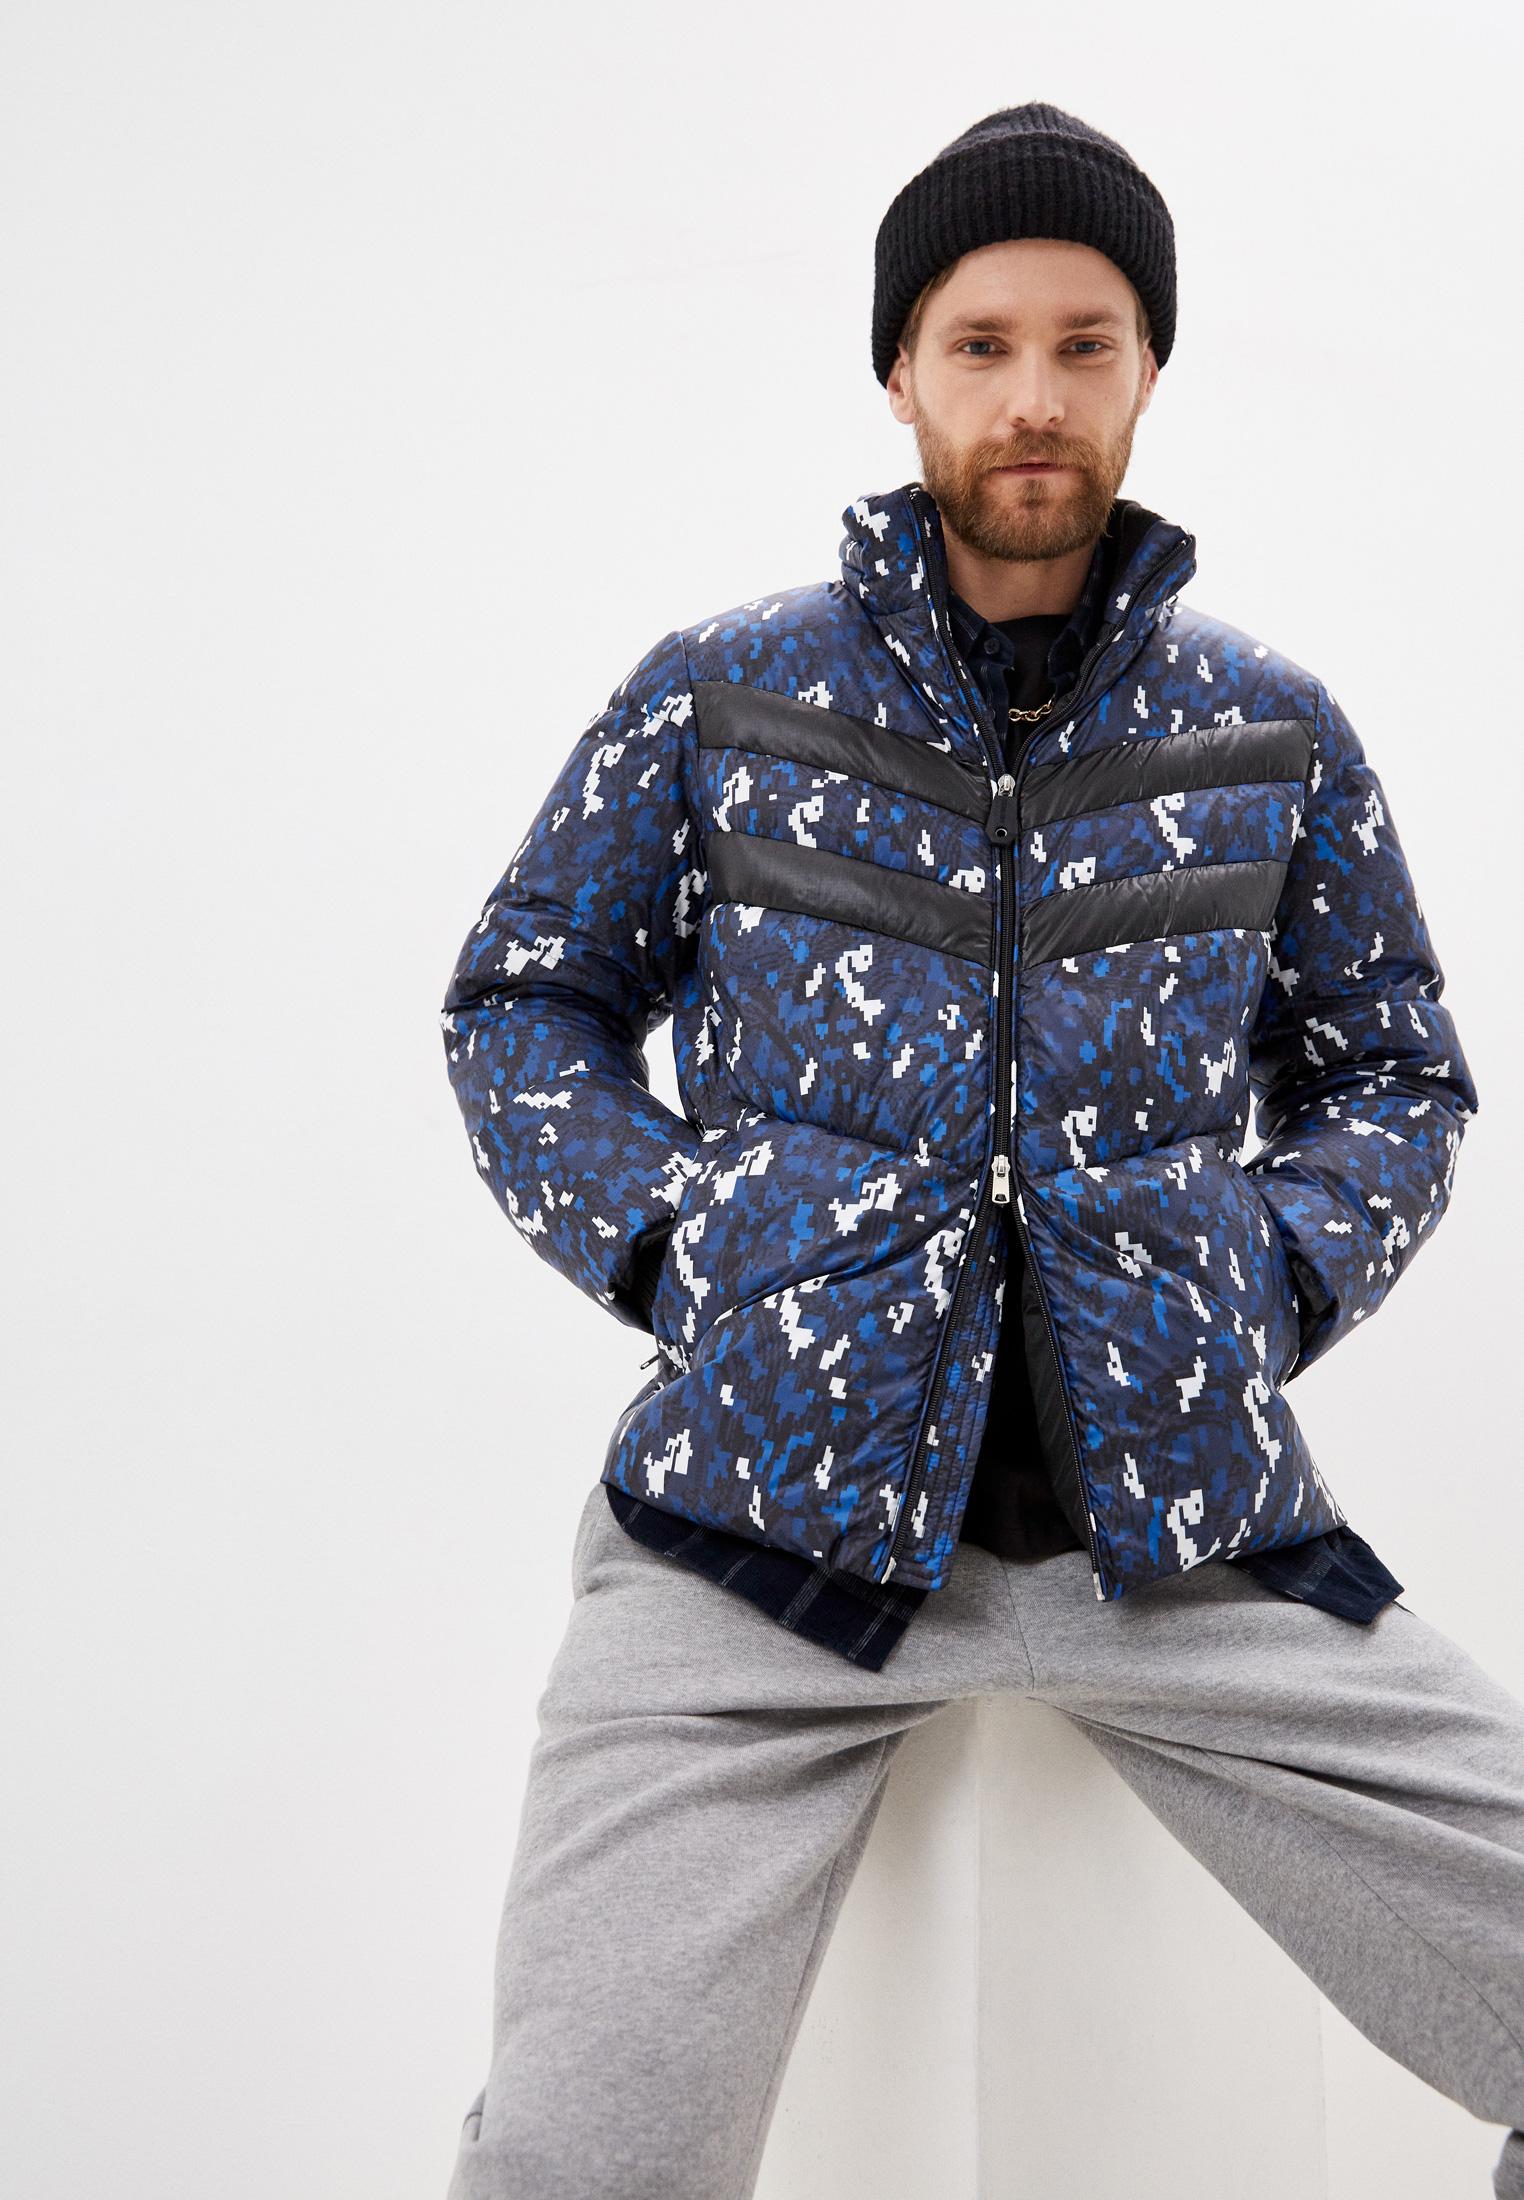 Мужская куртка Bikkembergs (Биккембергс) C H 052 00 T 9595: изображение 1